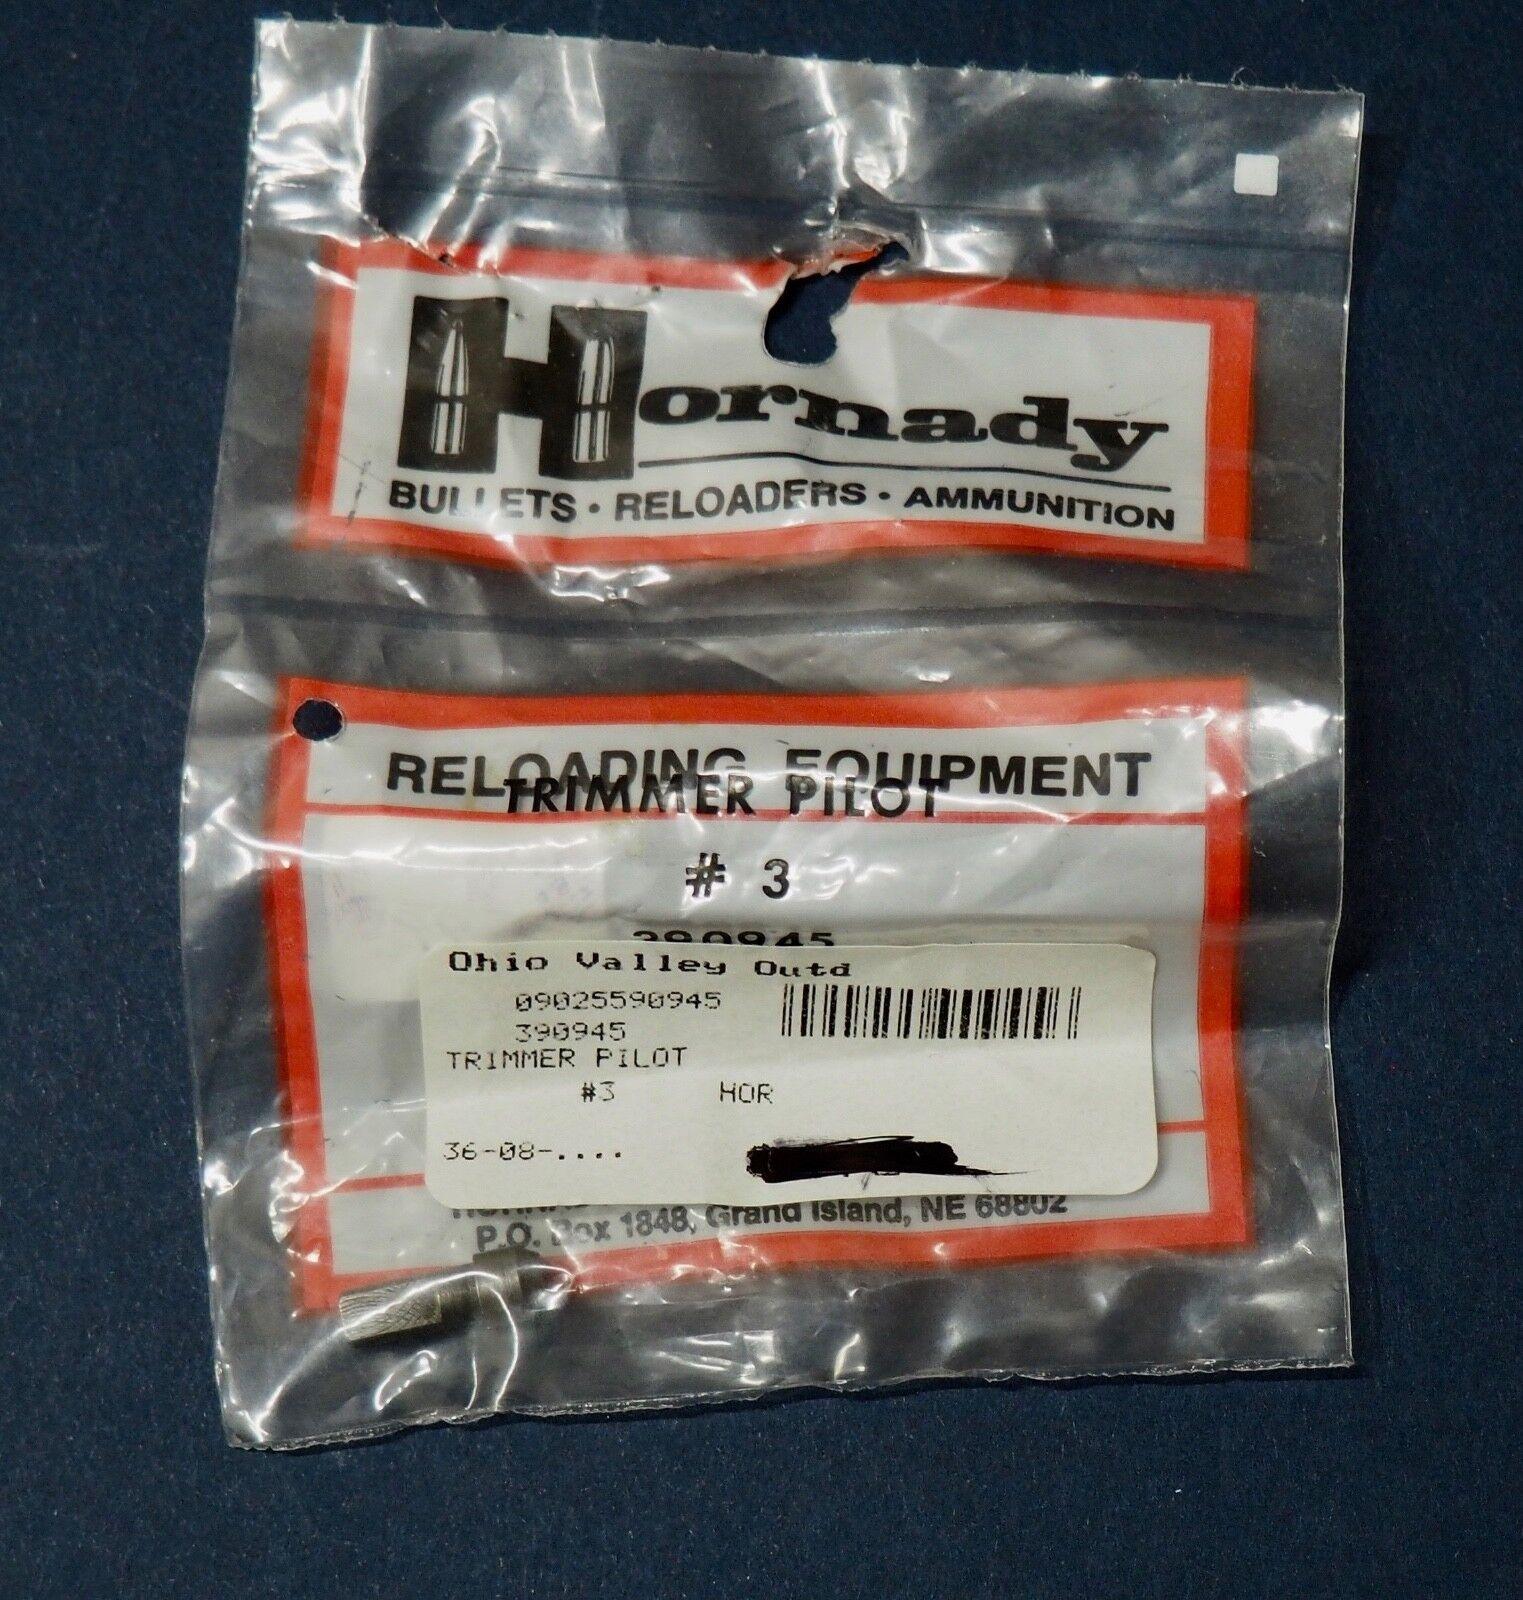 Hornady Case Trimmer Pilot #3  243 Cal Hunting 390945